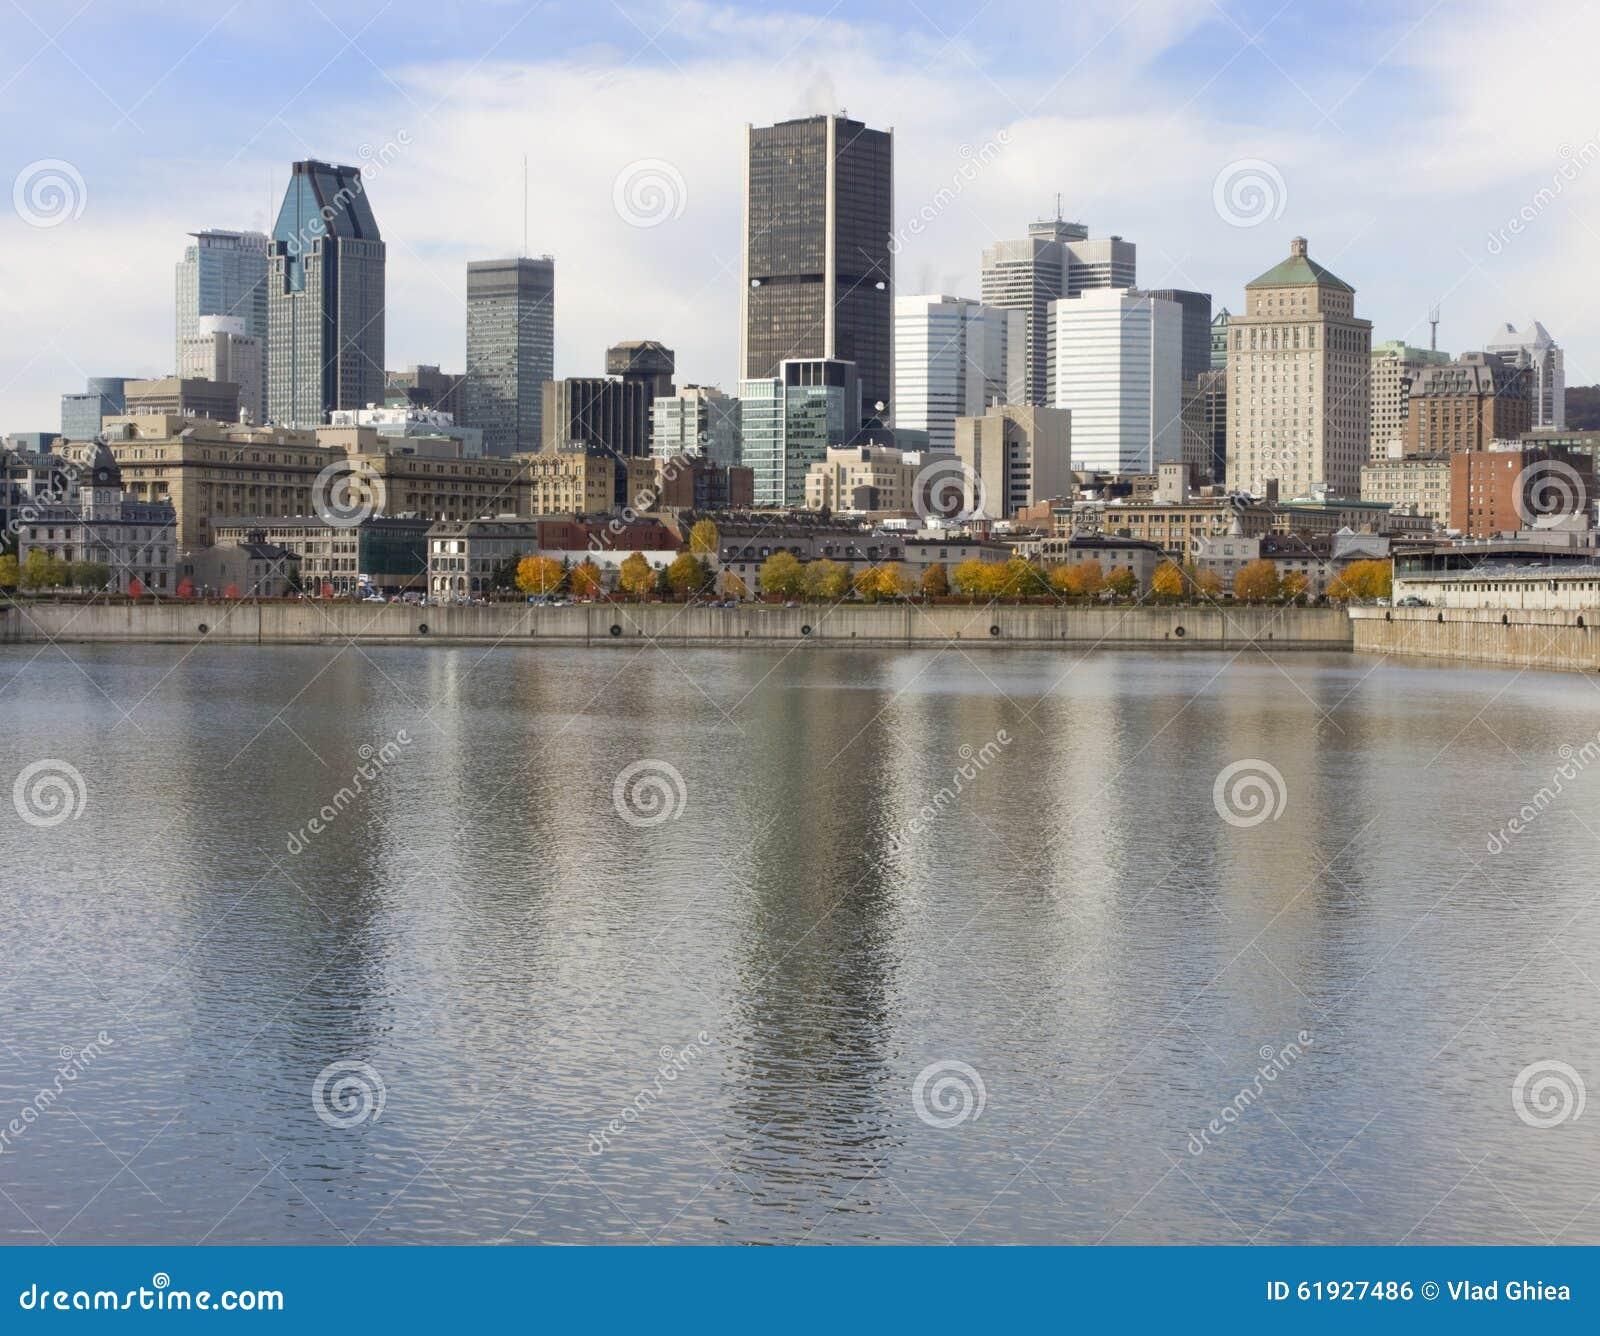 Montreal skyline and Saint Lawrence River